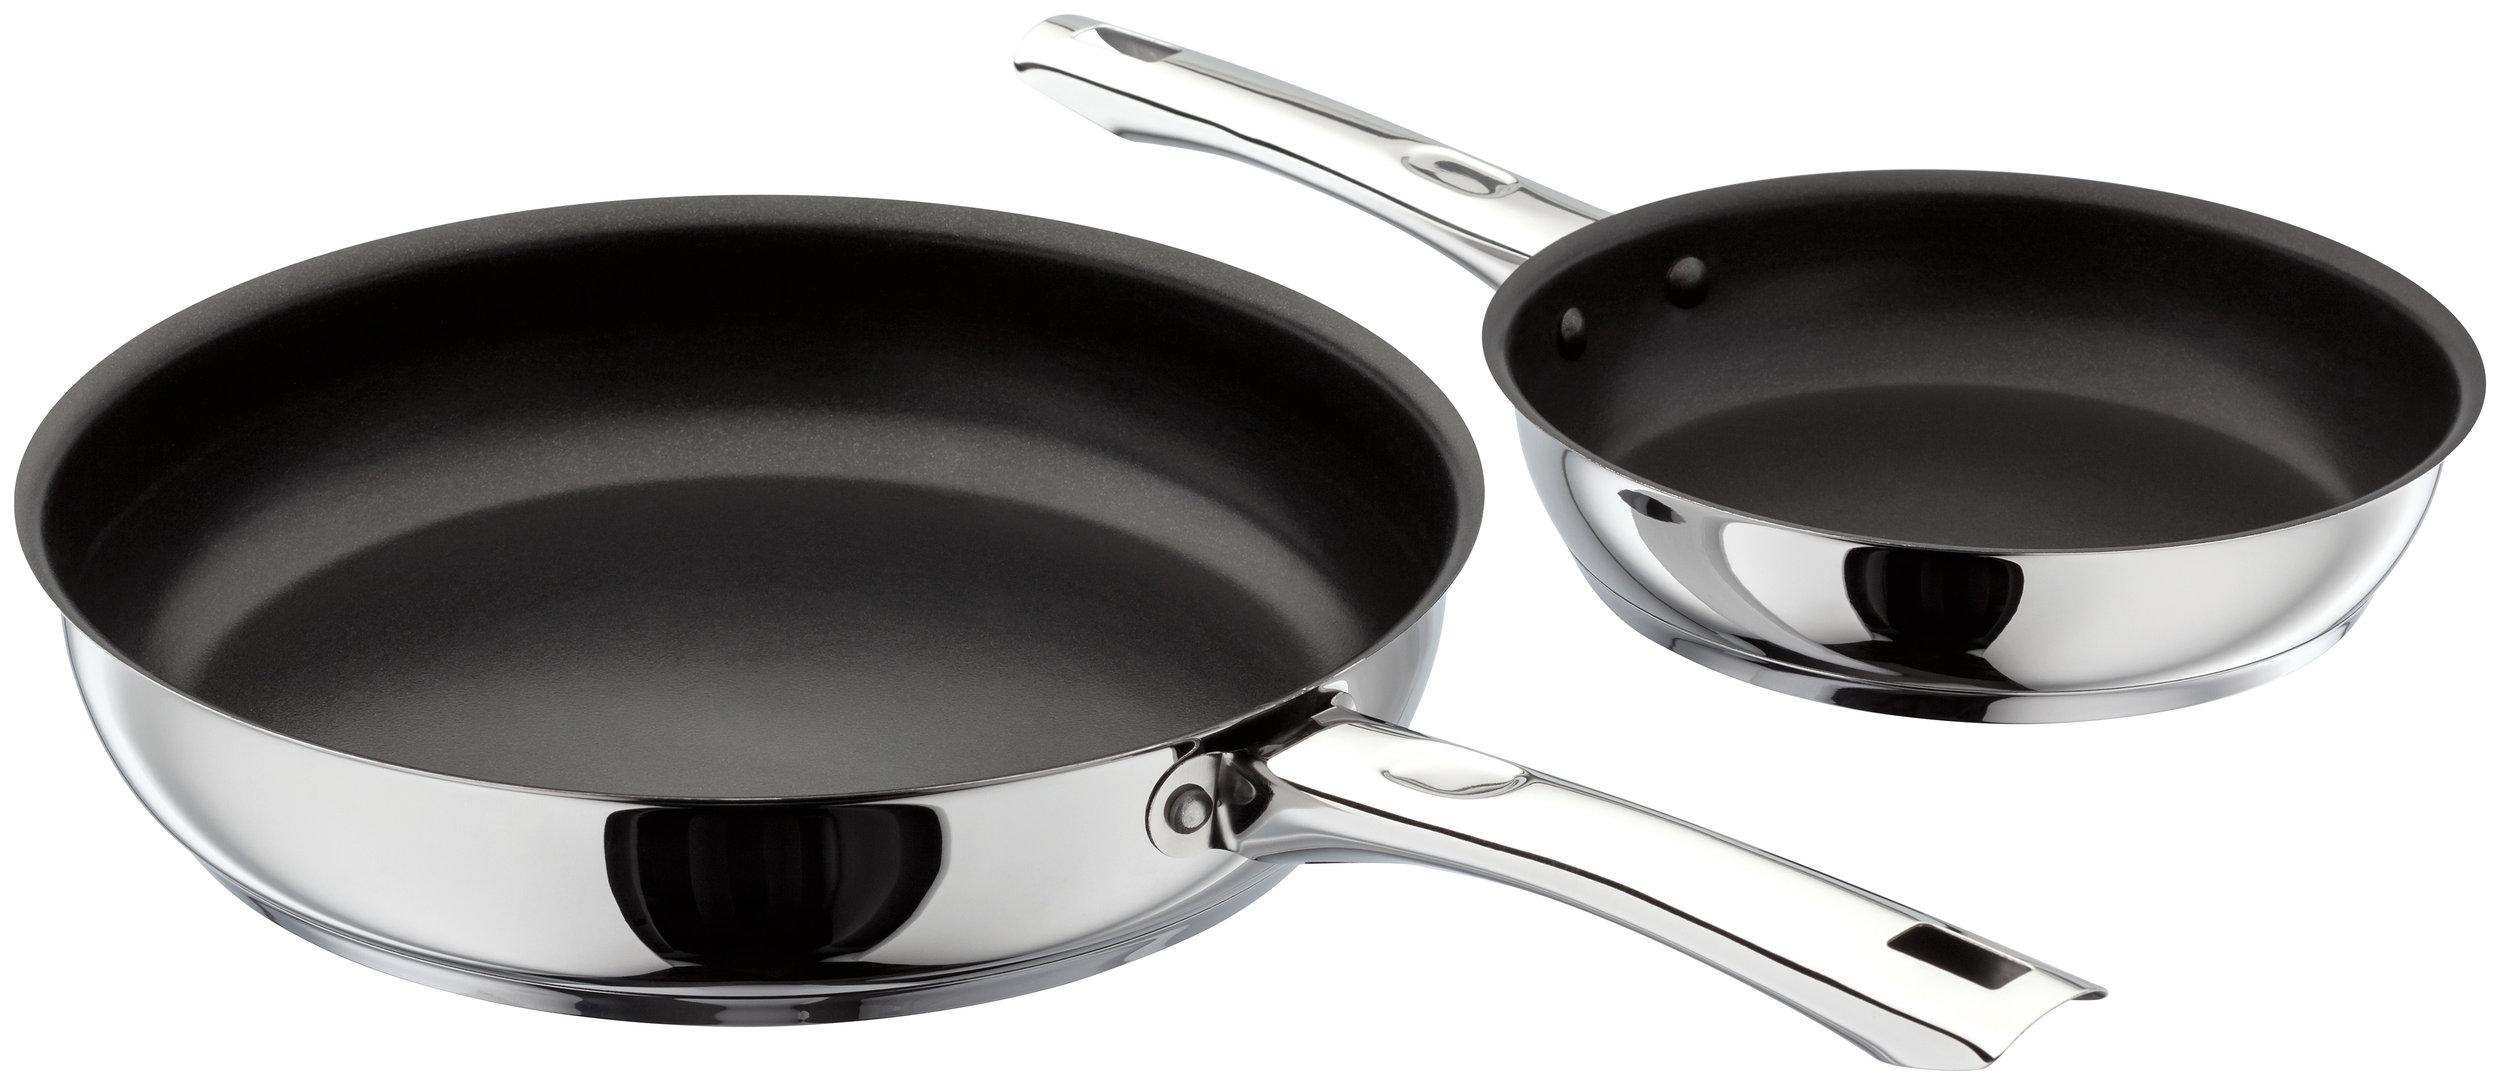 Kaufmann Sienna 2 Piece Frying Pan Set, Stainless Steel